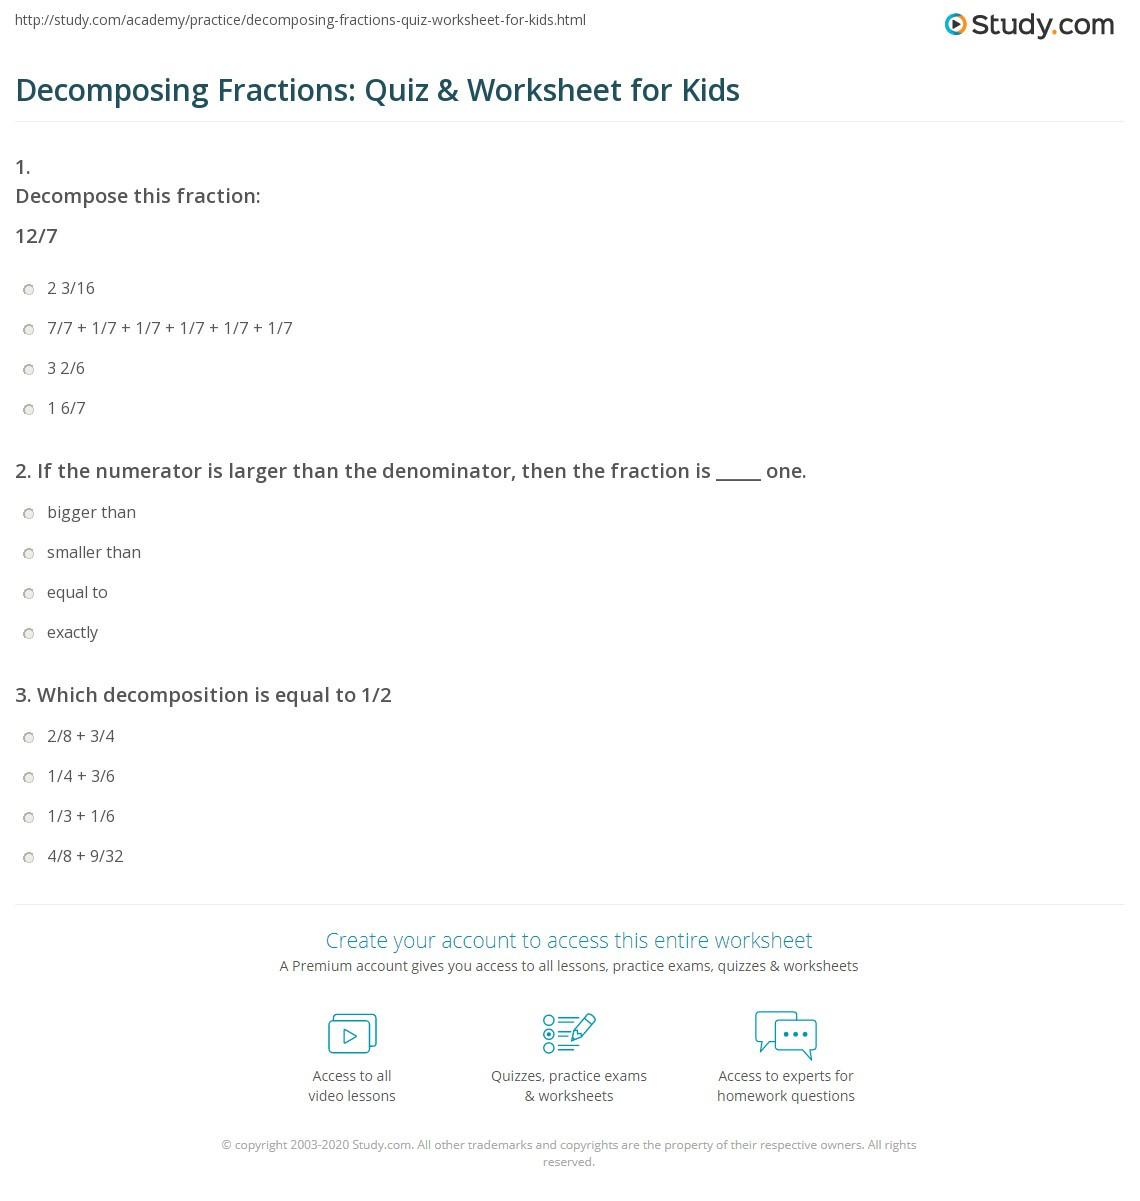 Decomposing Fractions 4th Grade Worksheet De Posing Fractions Worksheet